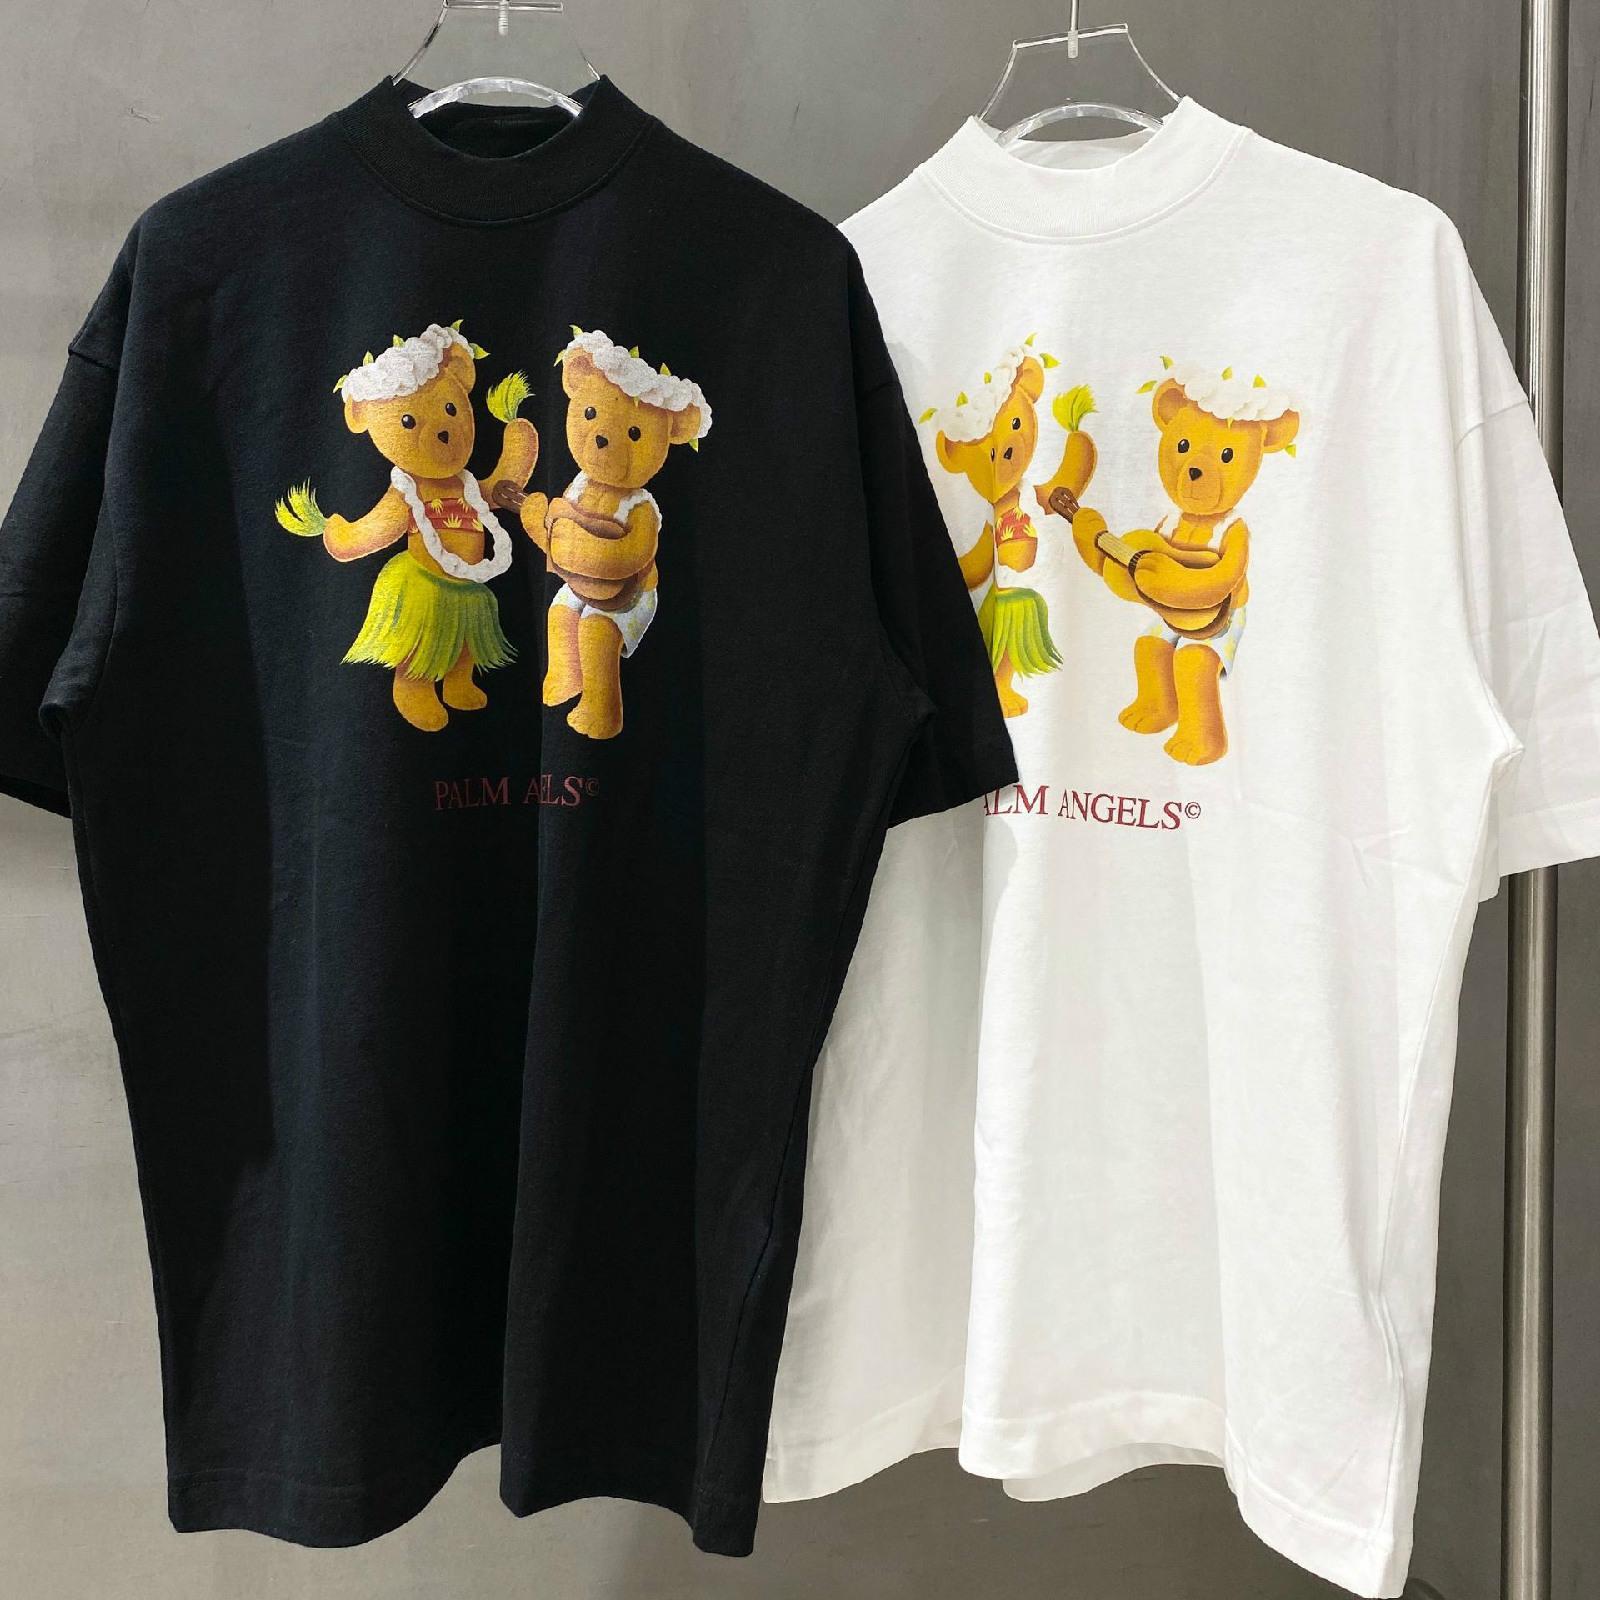 2020 high street tide brand fashion men and women t-shirt top quality female summer dress dancing couple teddy bear short sleeve US